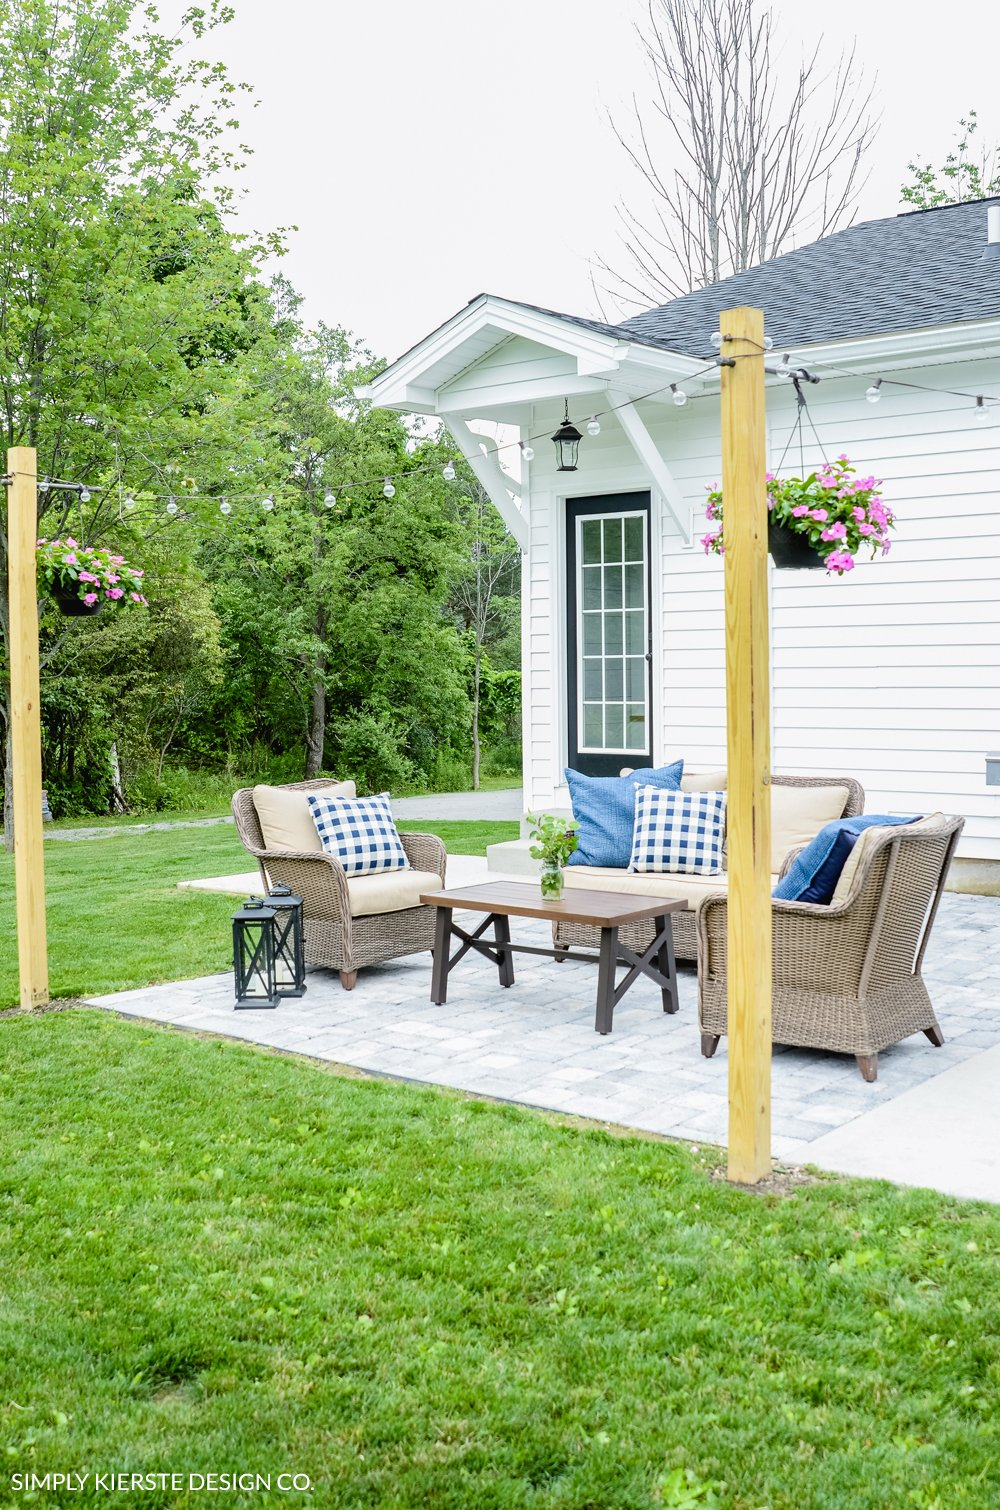 DIY Posts for Outdoor String Lights - Old Salt Farm on Backyard String Lights Diy  id=58927